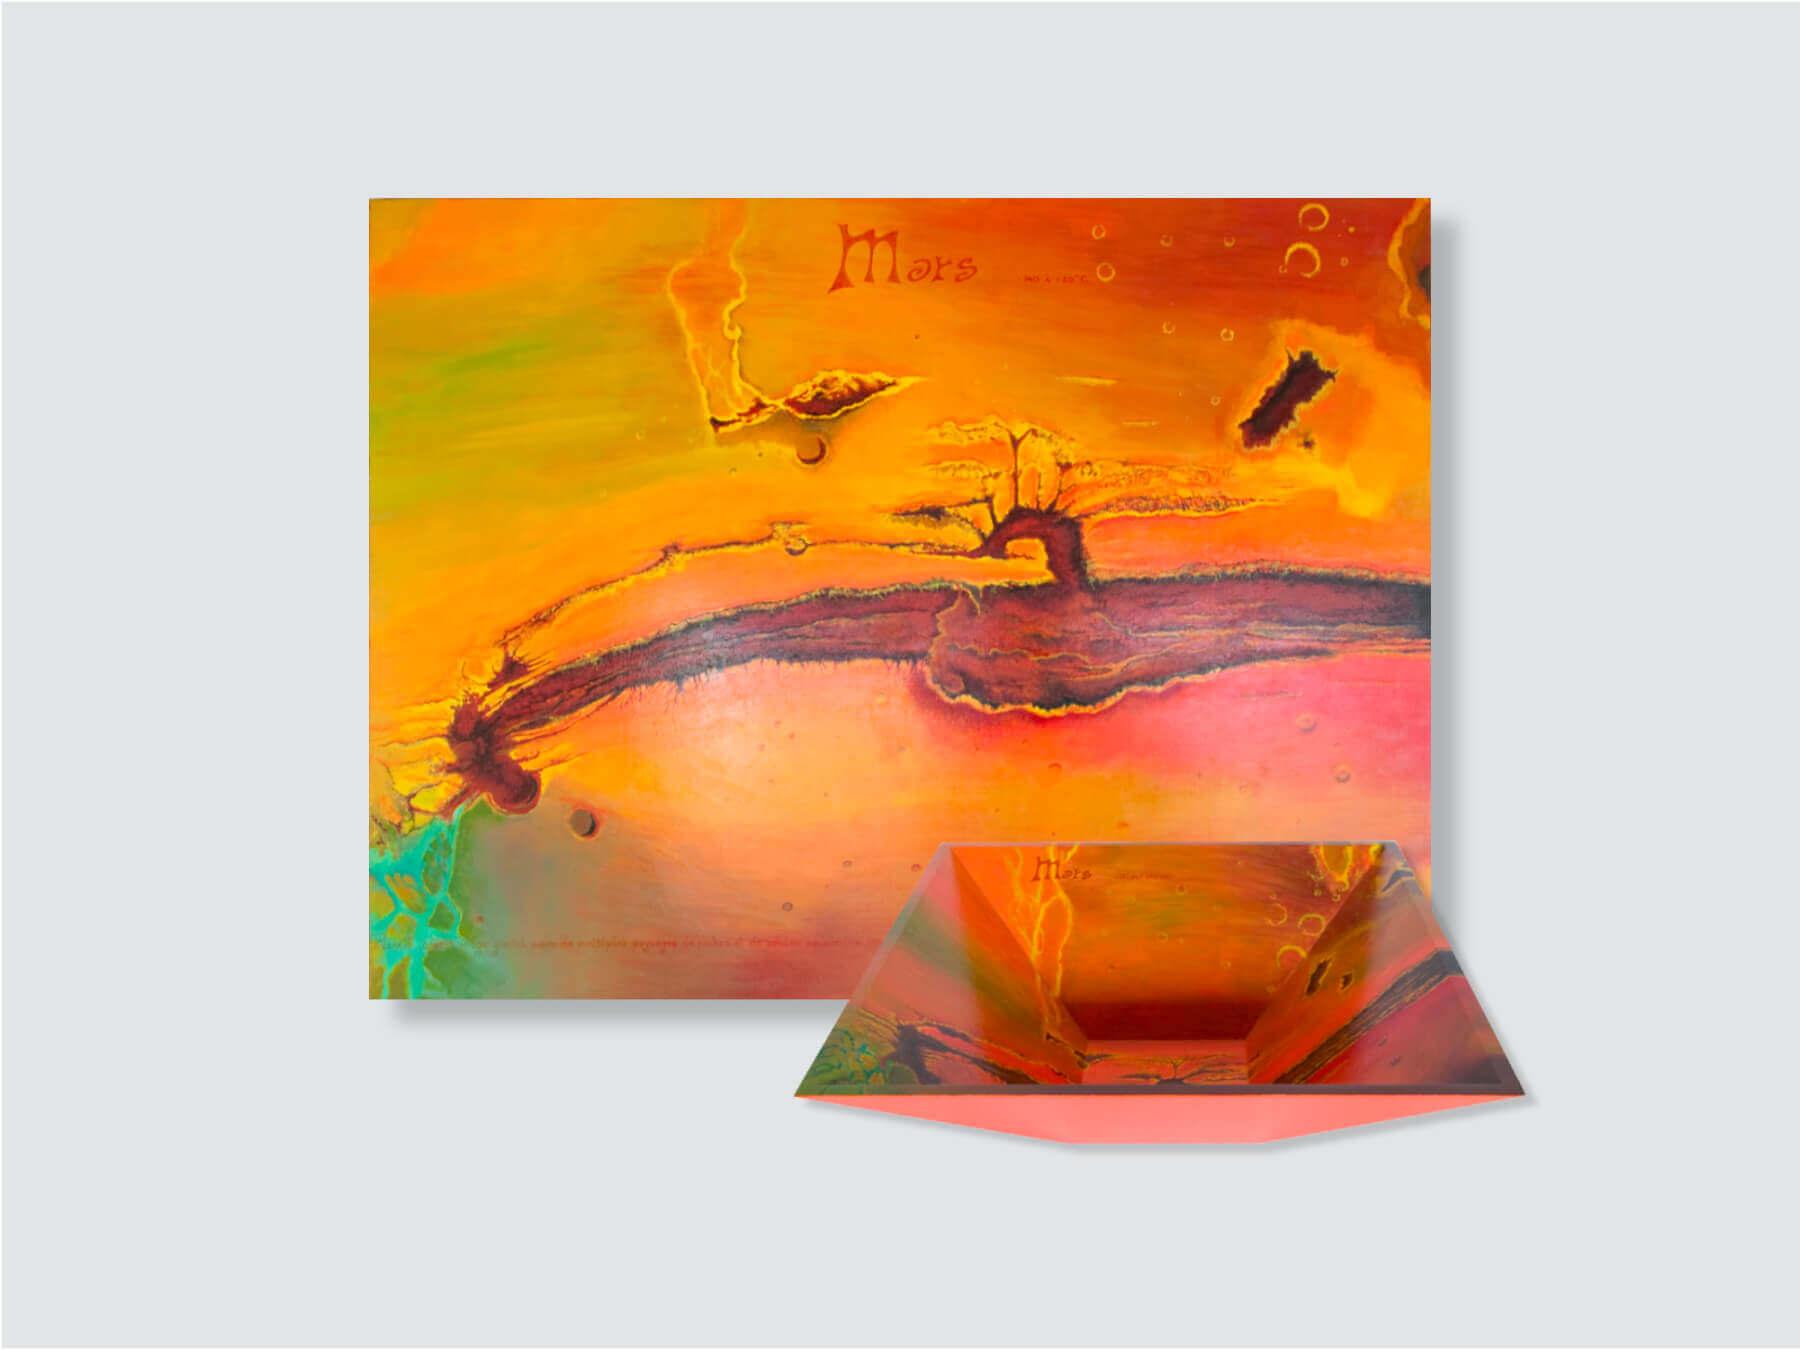 """Mars Planet"" Painting & Pyramidal Bowl- 92x70x5cm + 45x45x15cm / 36.2x27.5x2 in + 17.7x17.7x5.9 in"